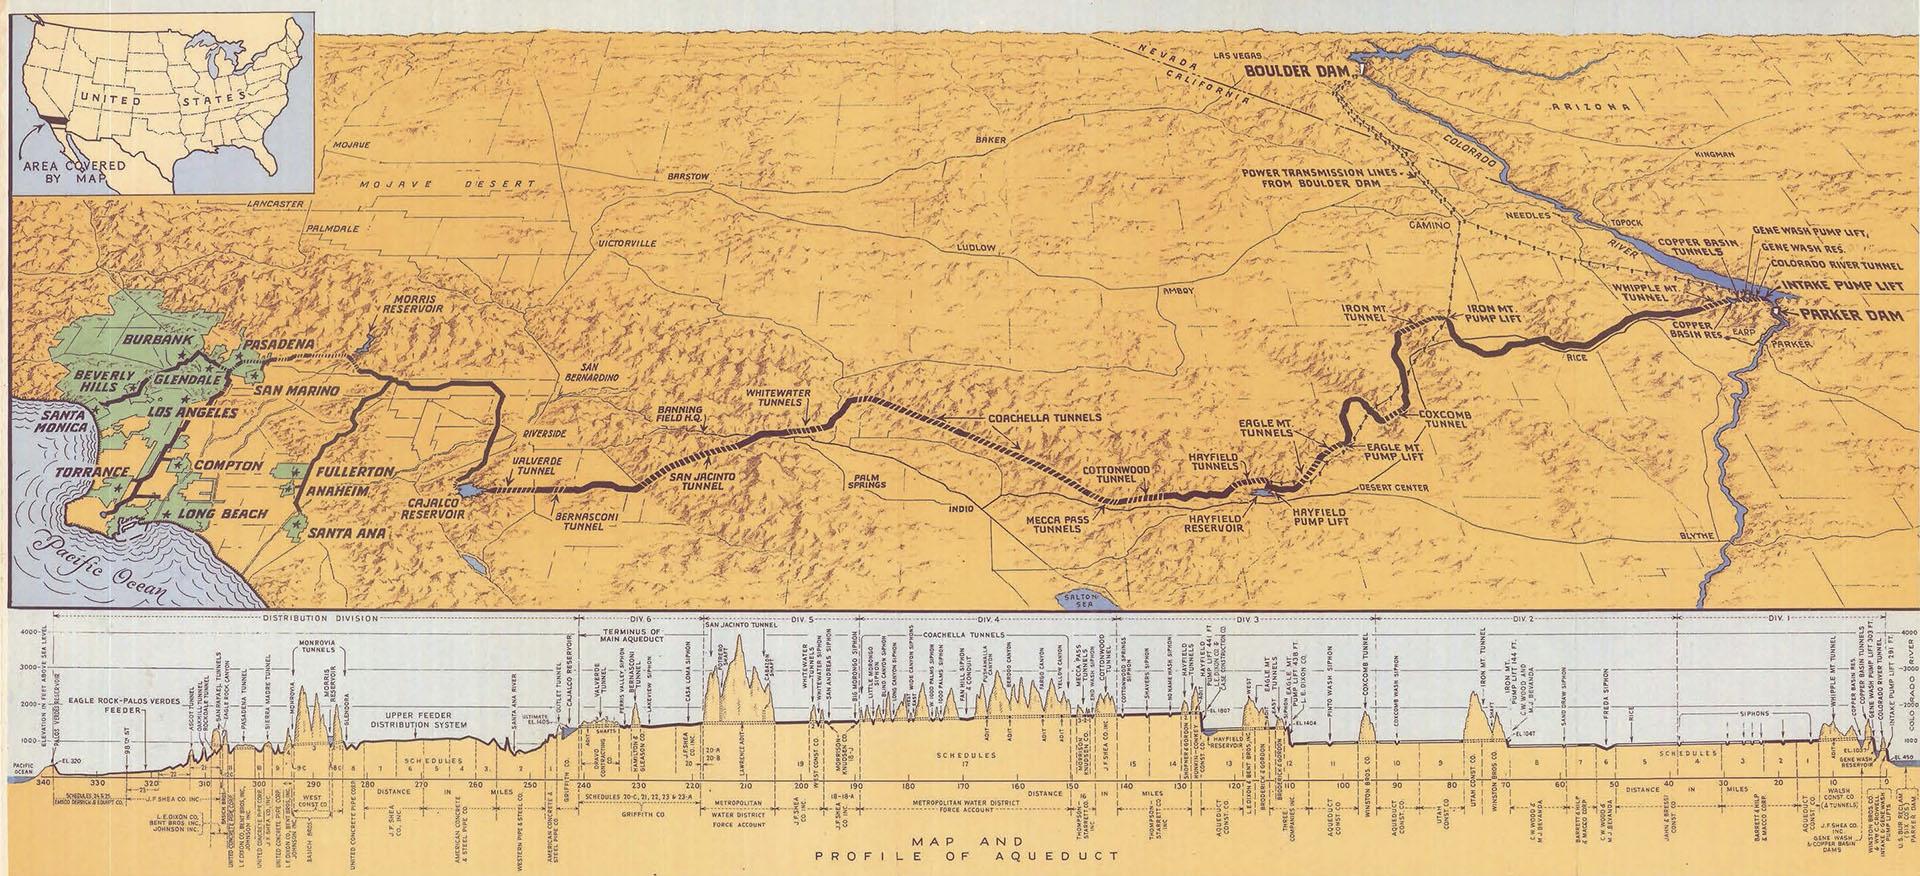 1939 map of the Colorado River Aqueduct